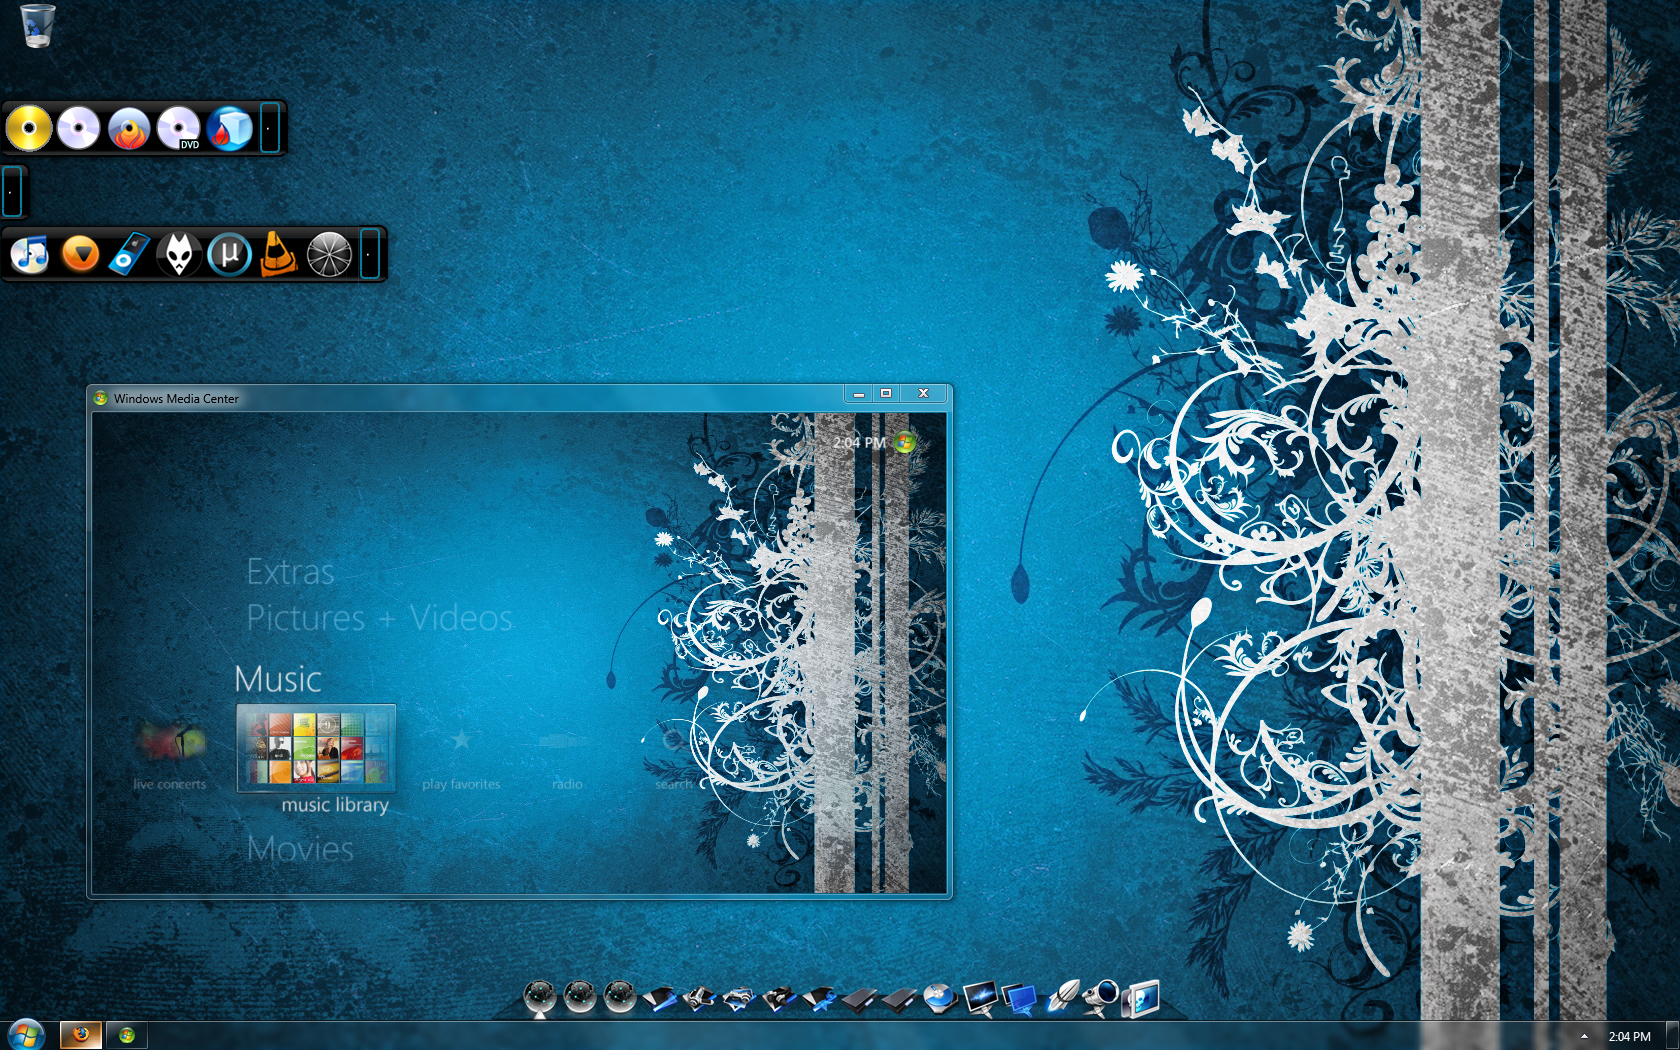 Windows Media Center Windows 7